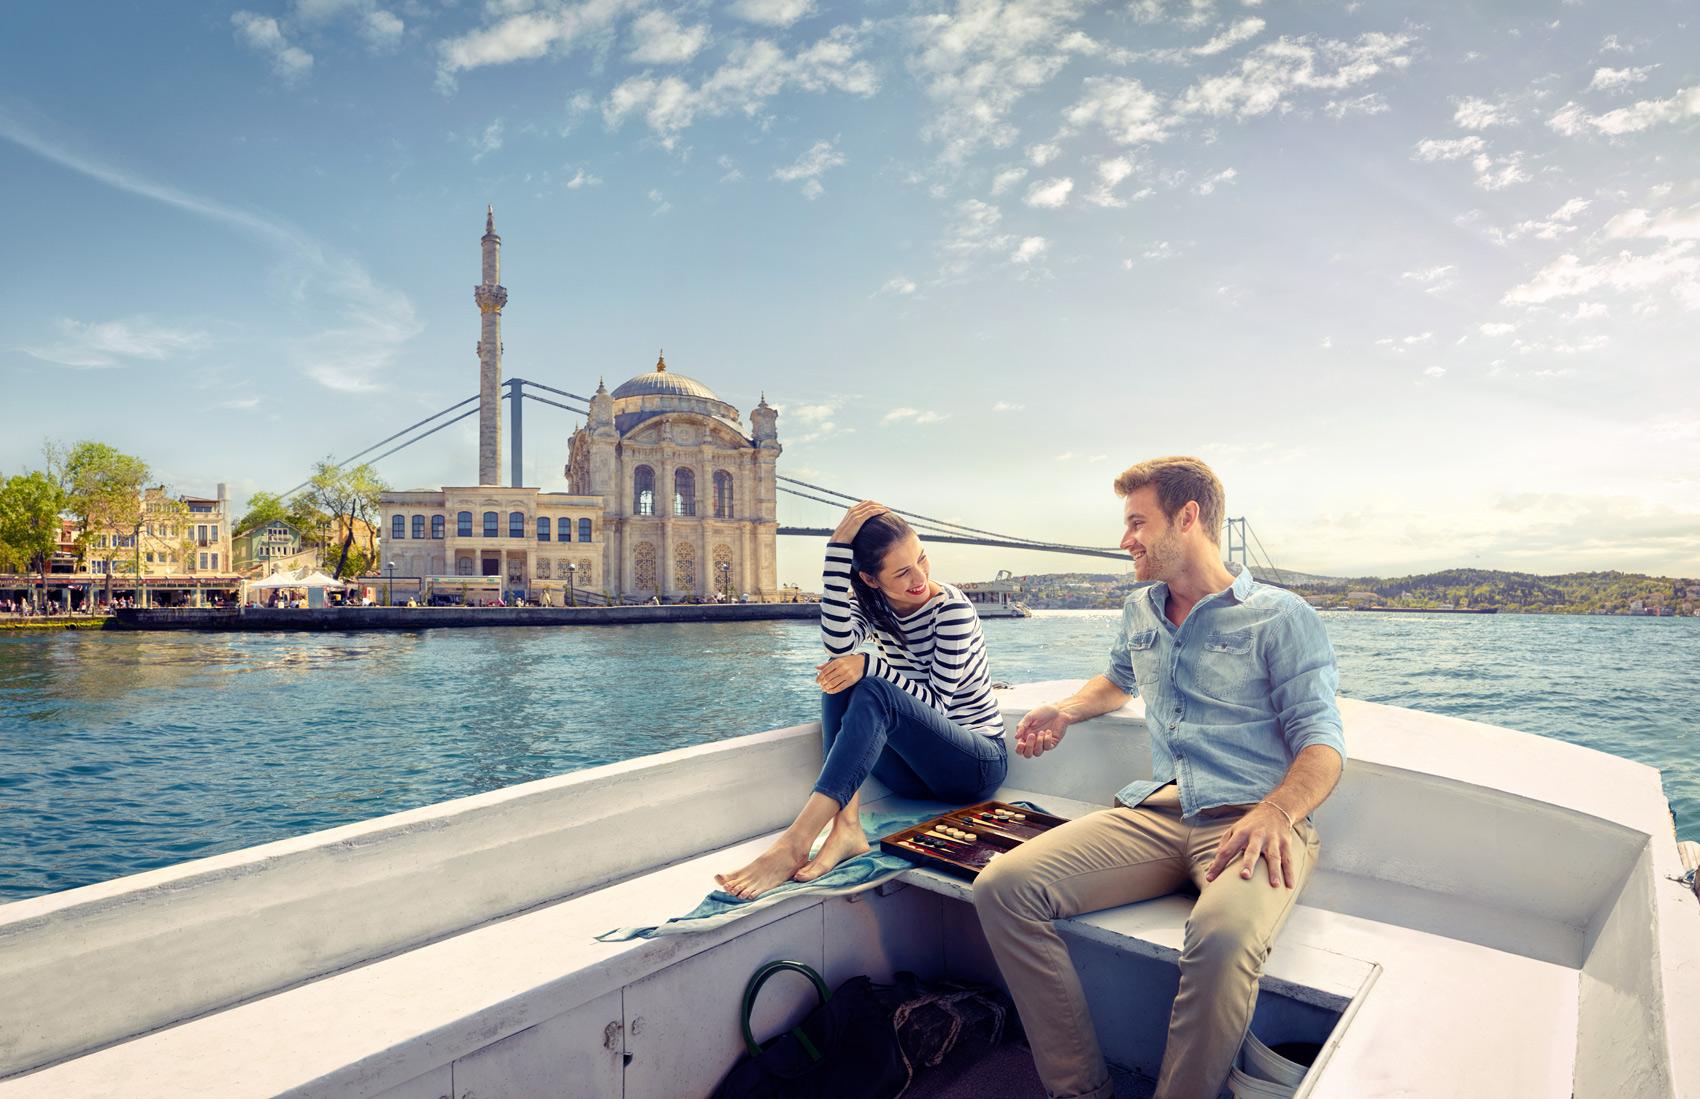 EuroTravel_IstanbulBoat_v1b.jpg